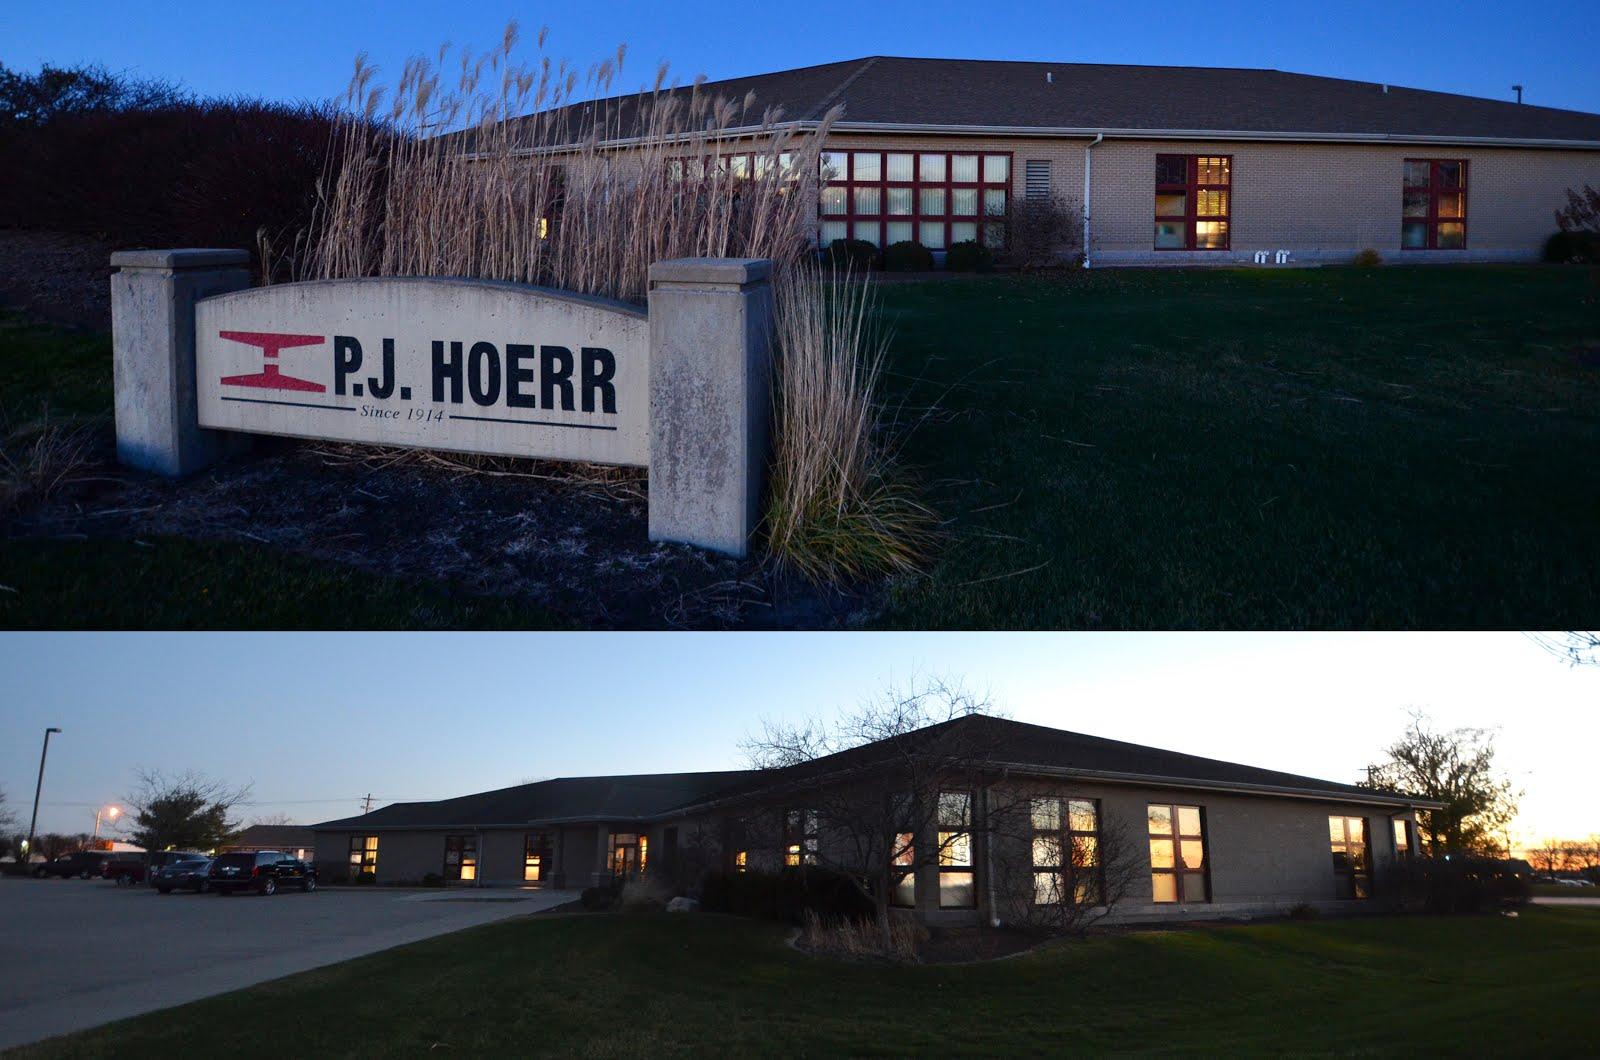 P.J. Hoerr Peoria Office